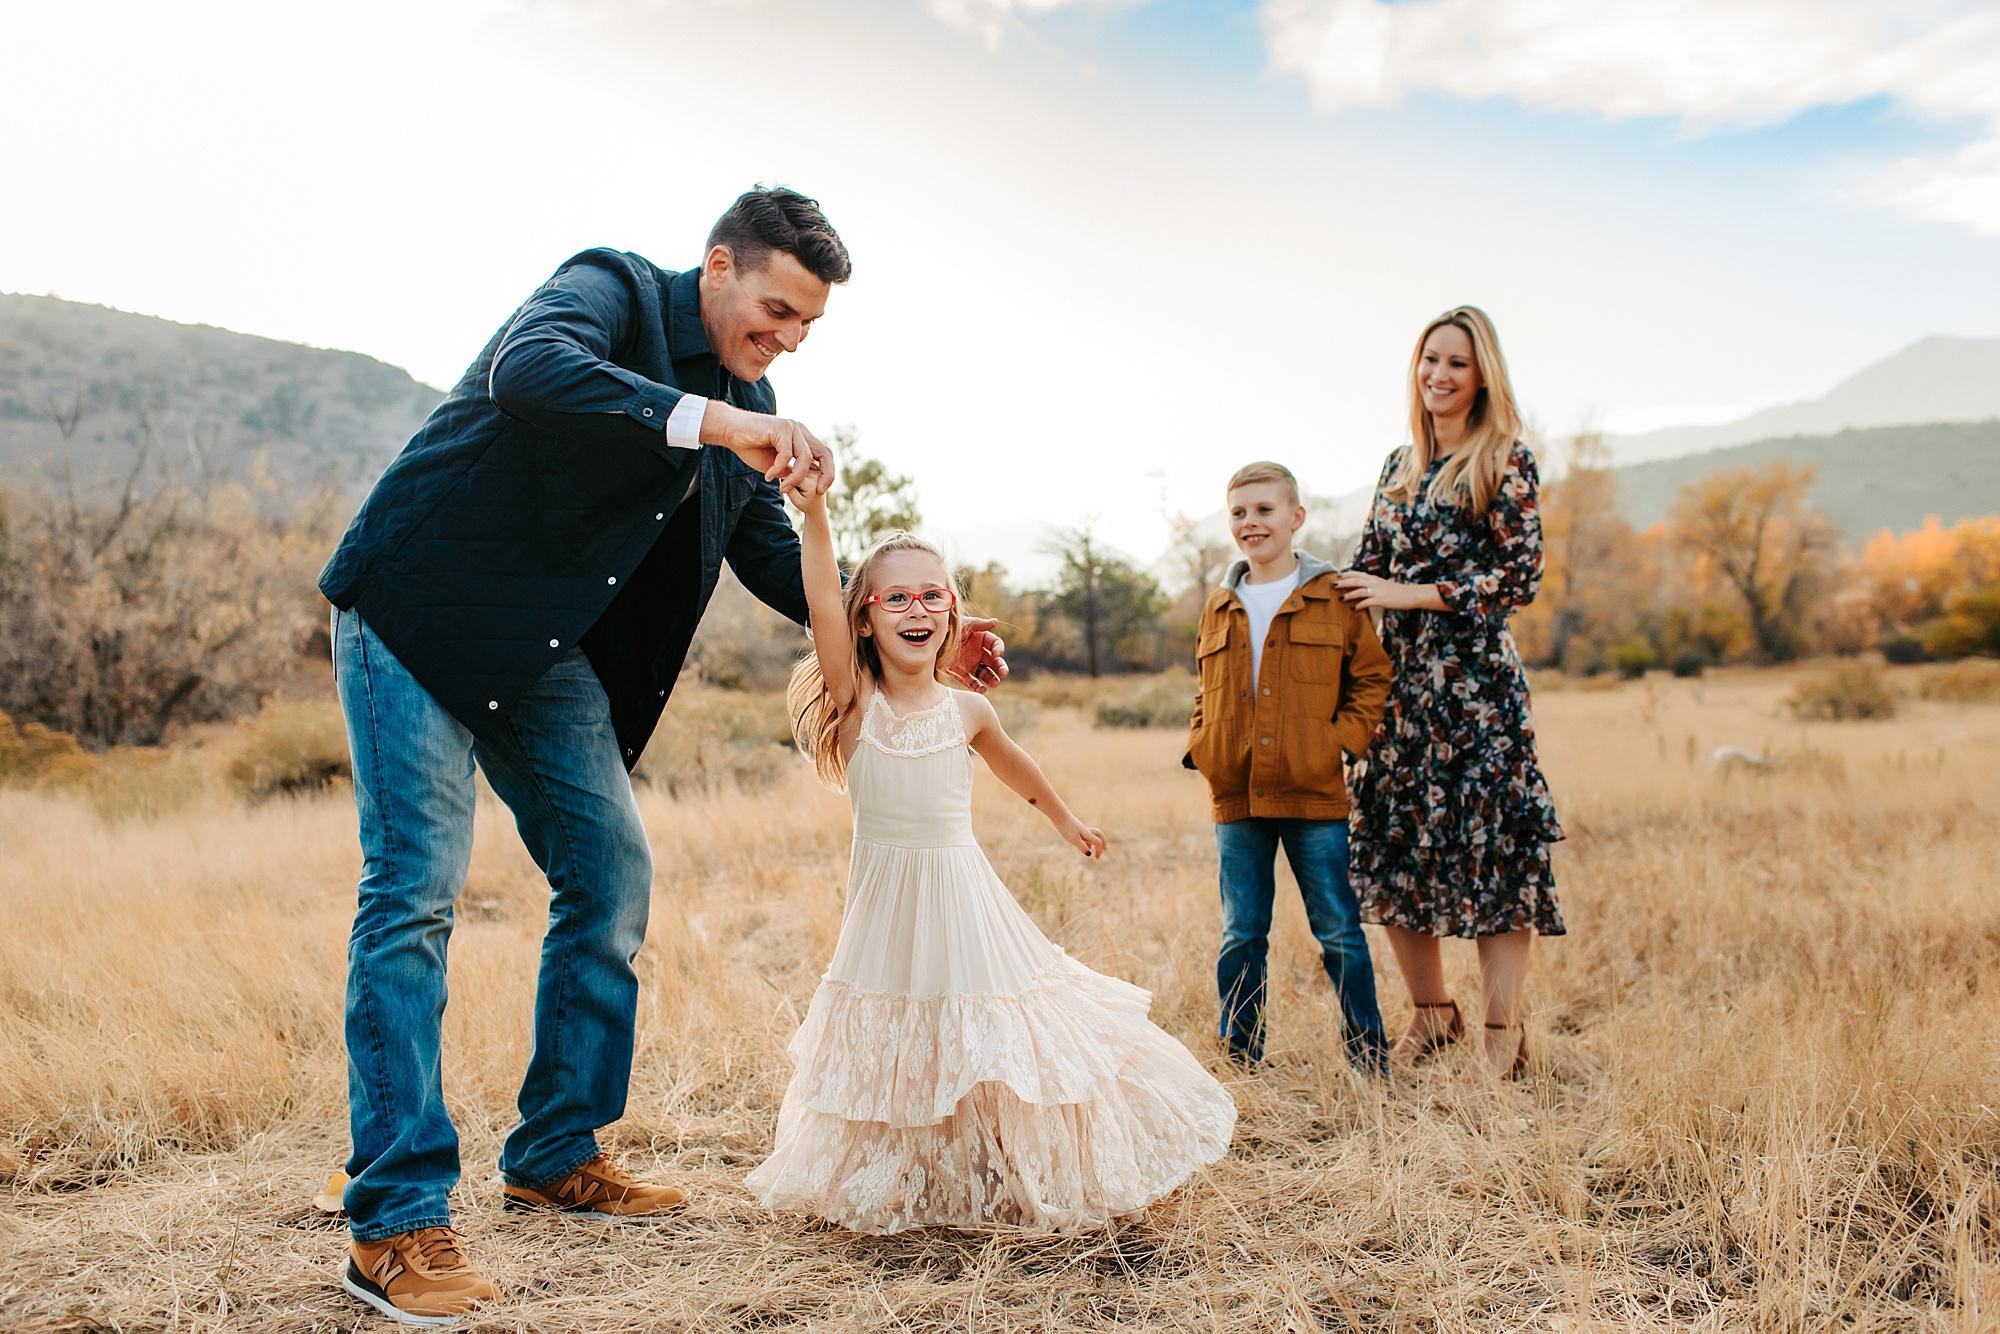 family photography denver   www.julielivermorephotography.com